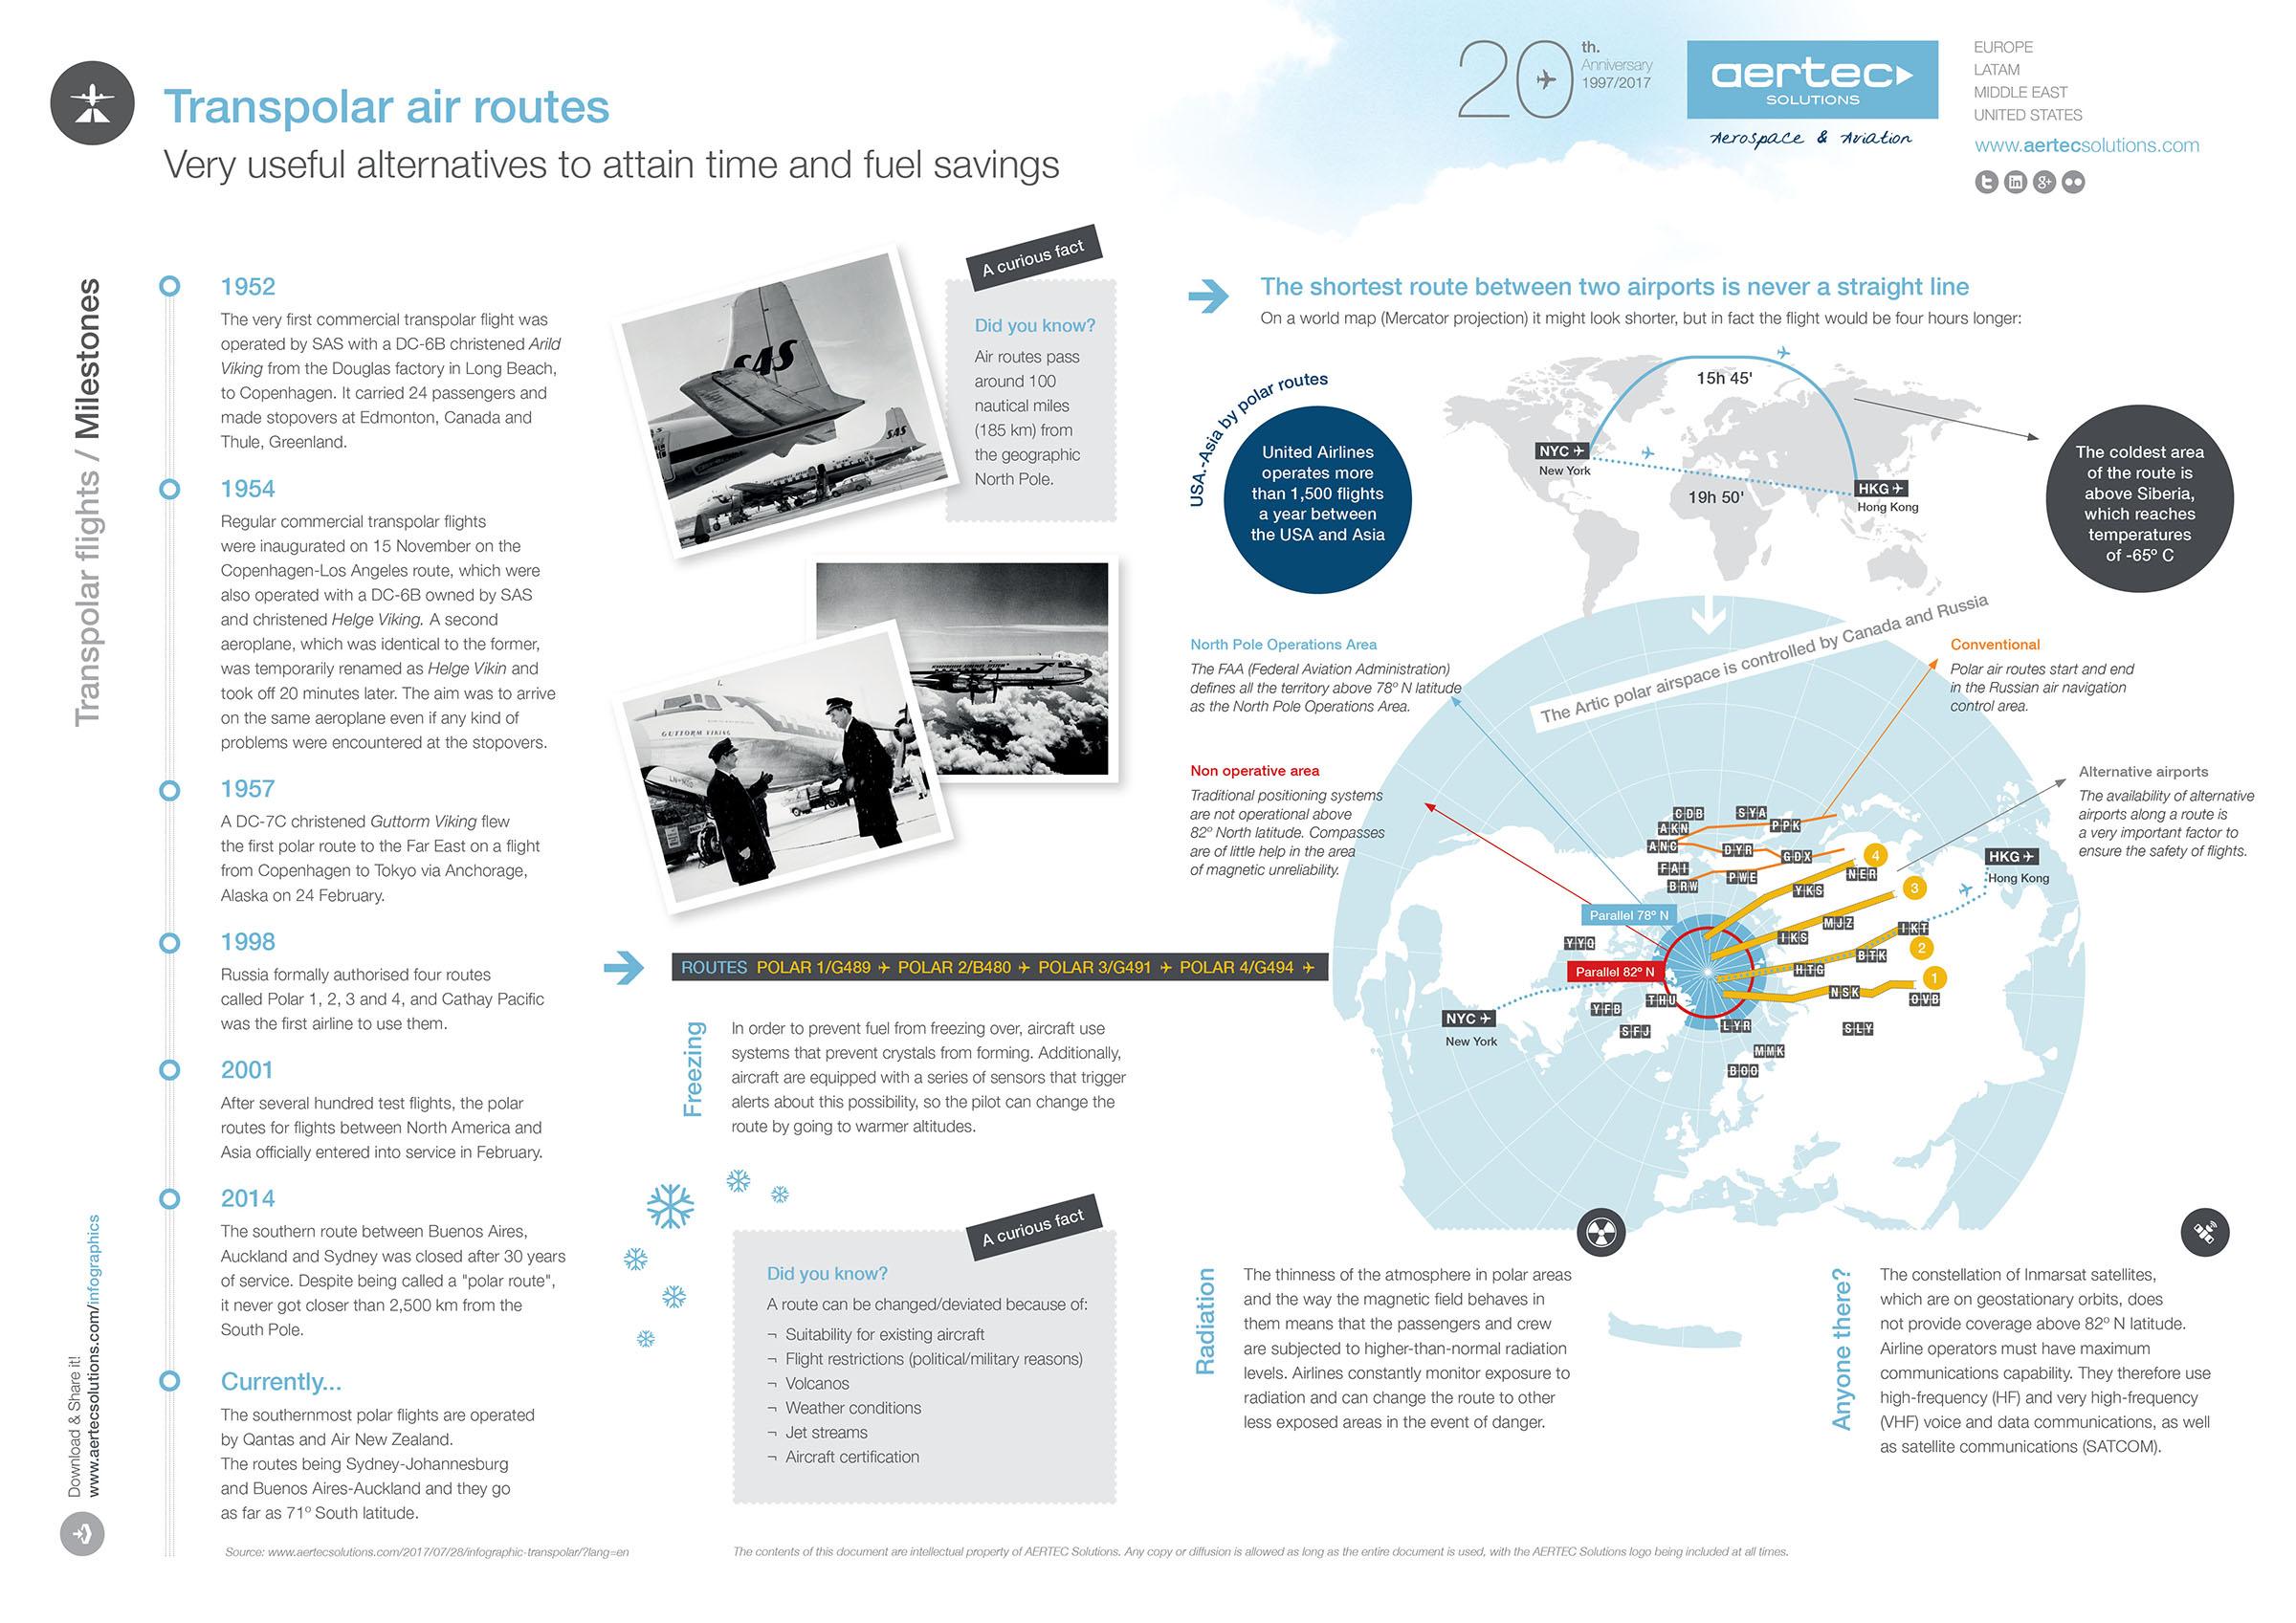 Transpolar air routes